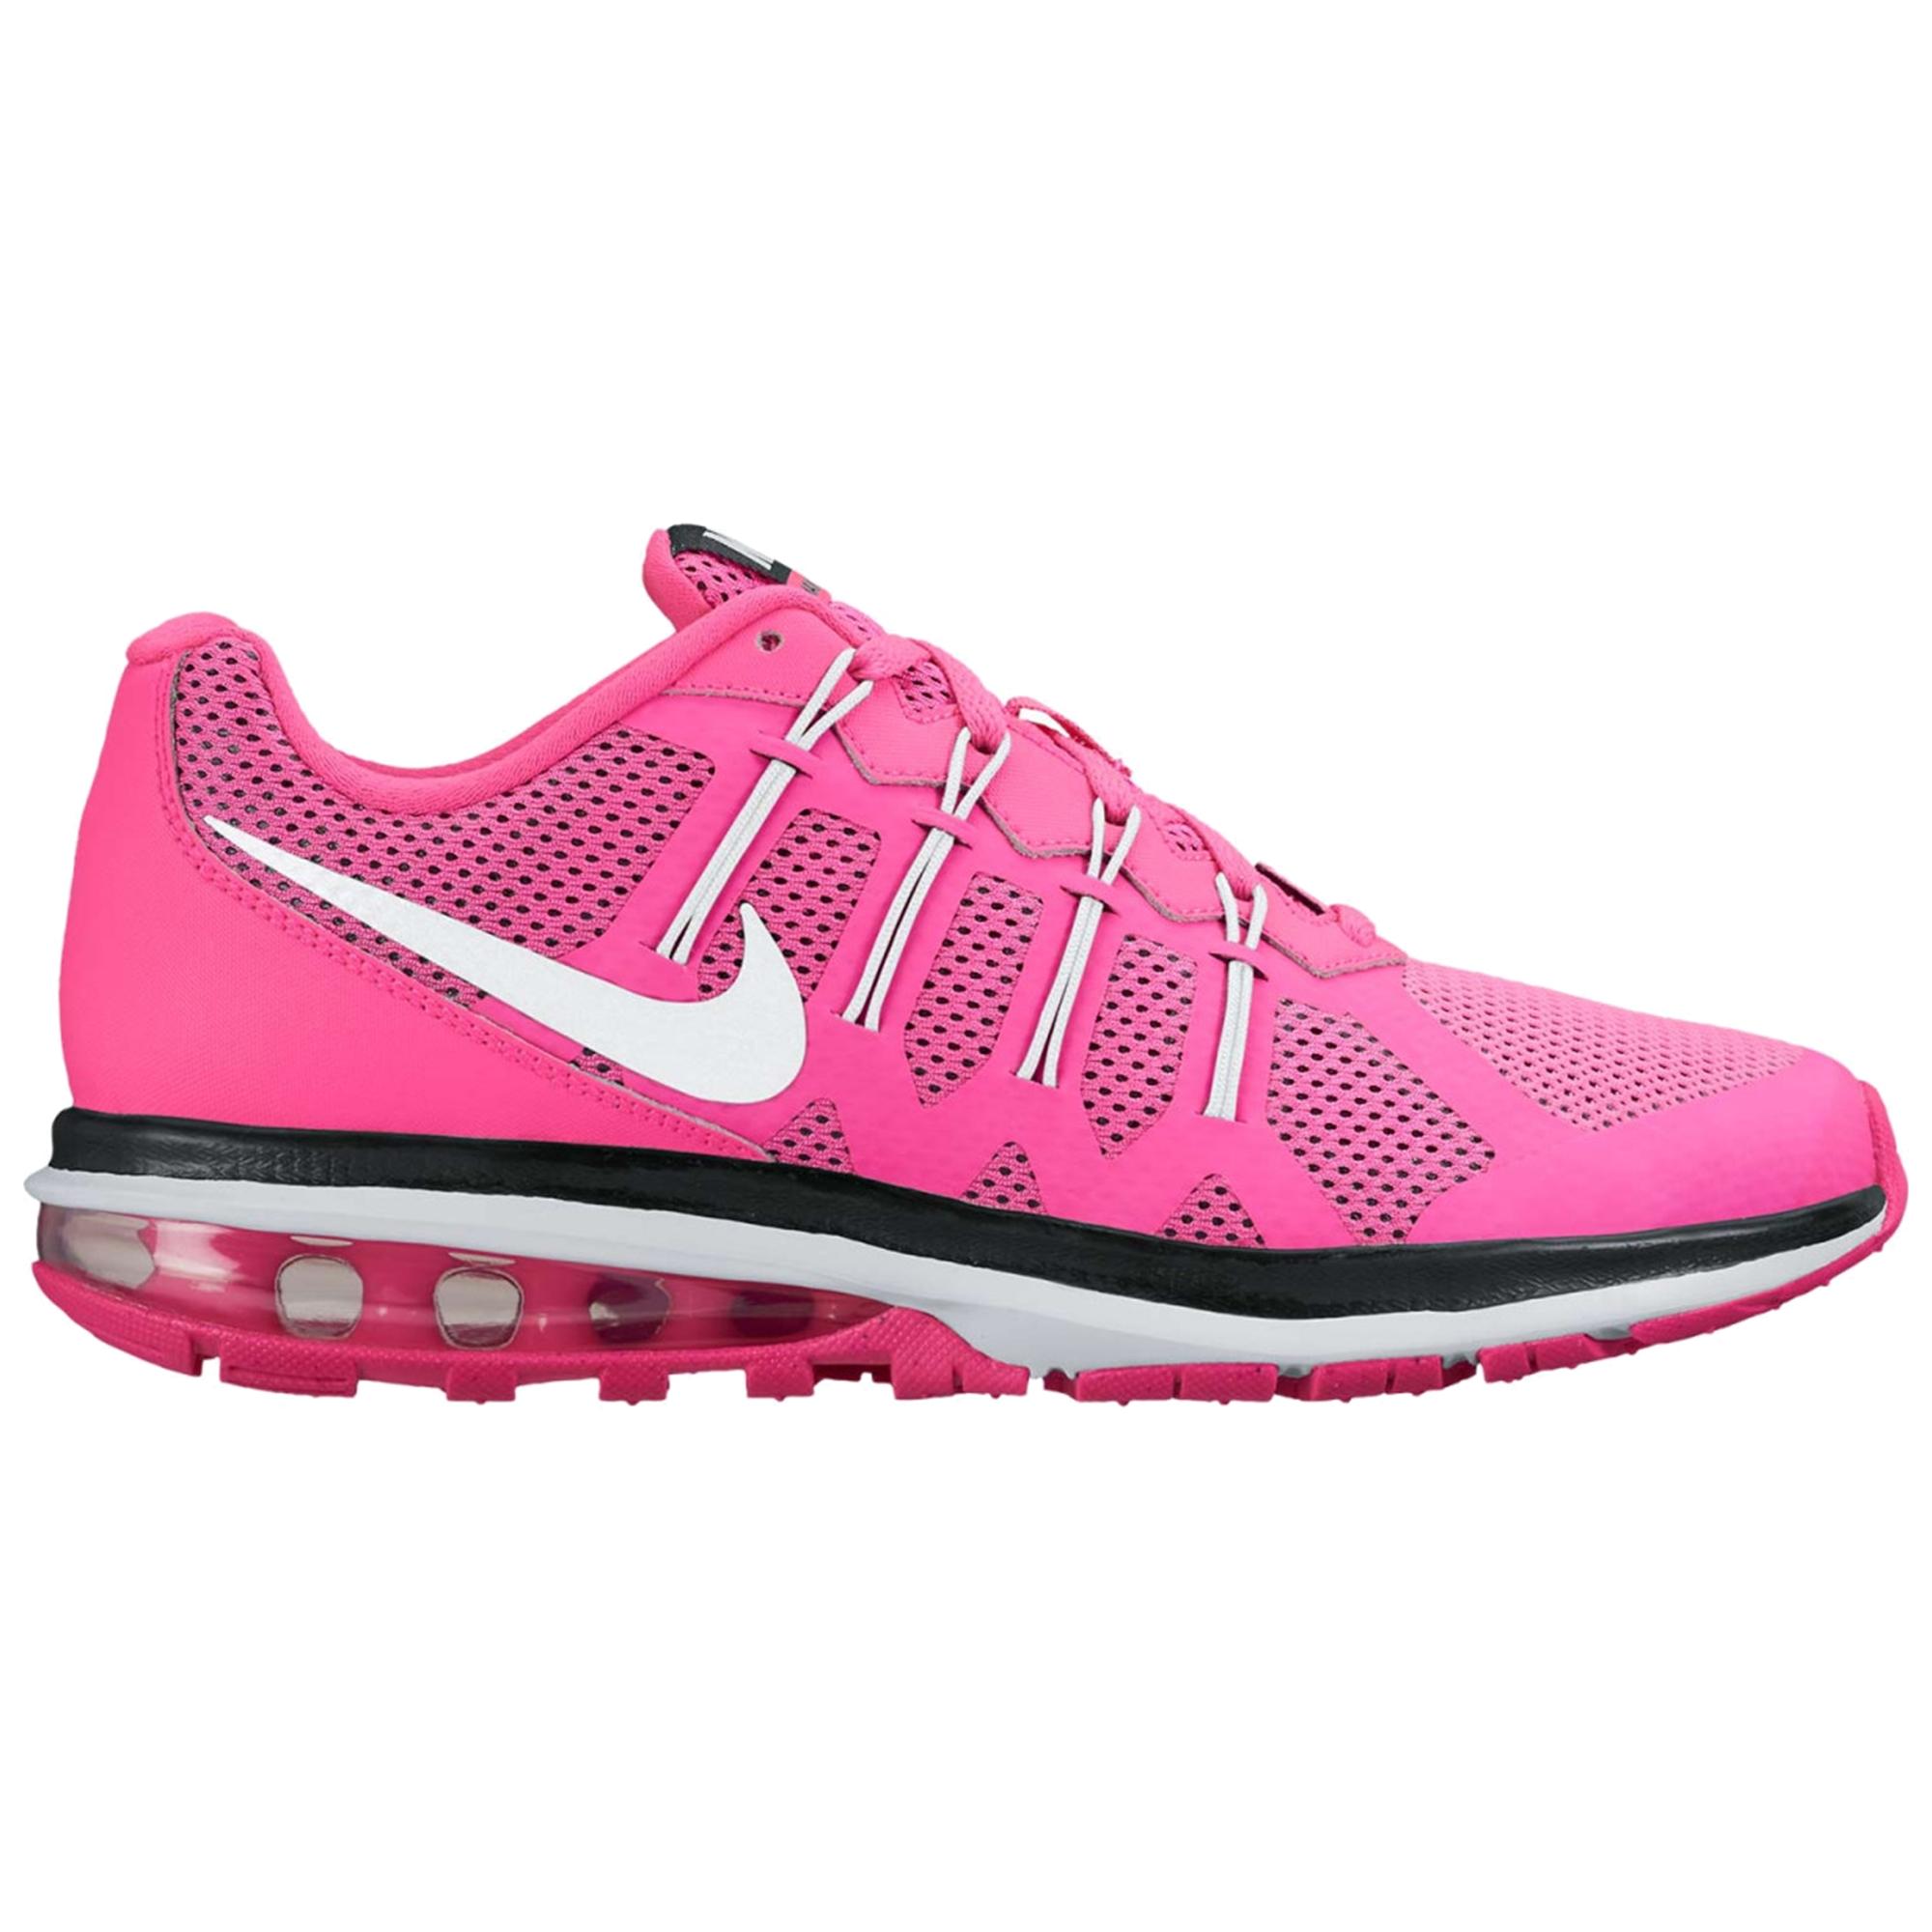 4ef64b7d9e3 ... Nike Air Max Dynasty Kadın Spor Ayakkabı